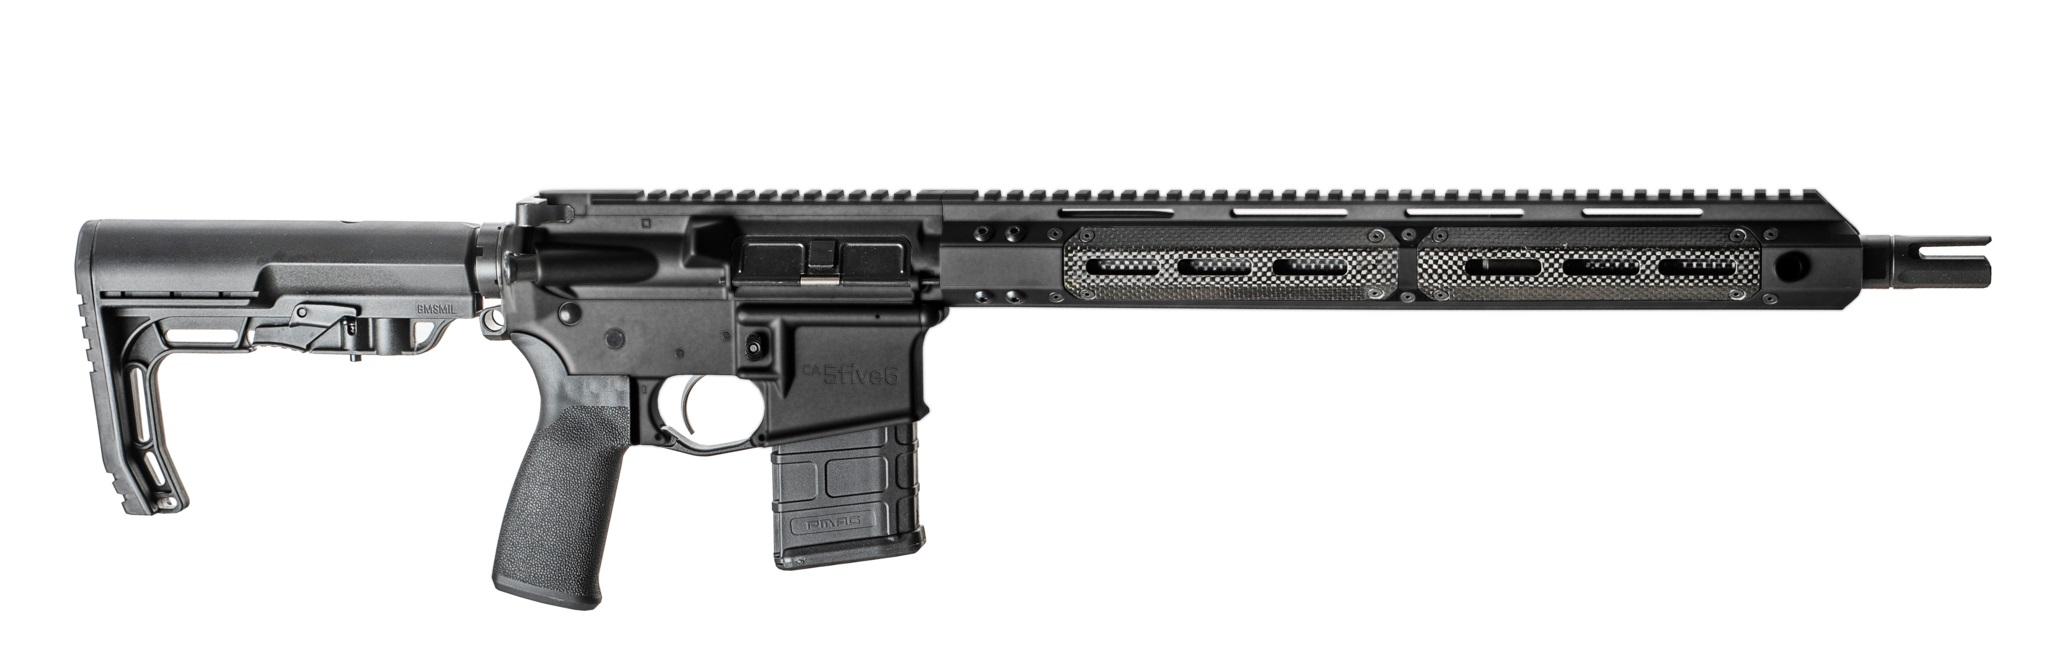 Christensen Arms CA5FIVE6 223 Rem   5.56 NATO